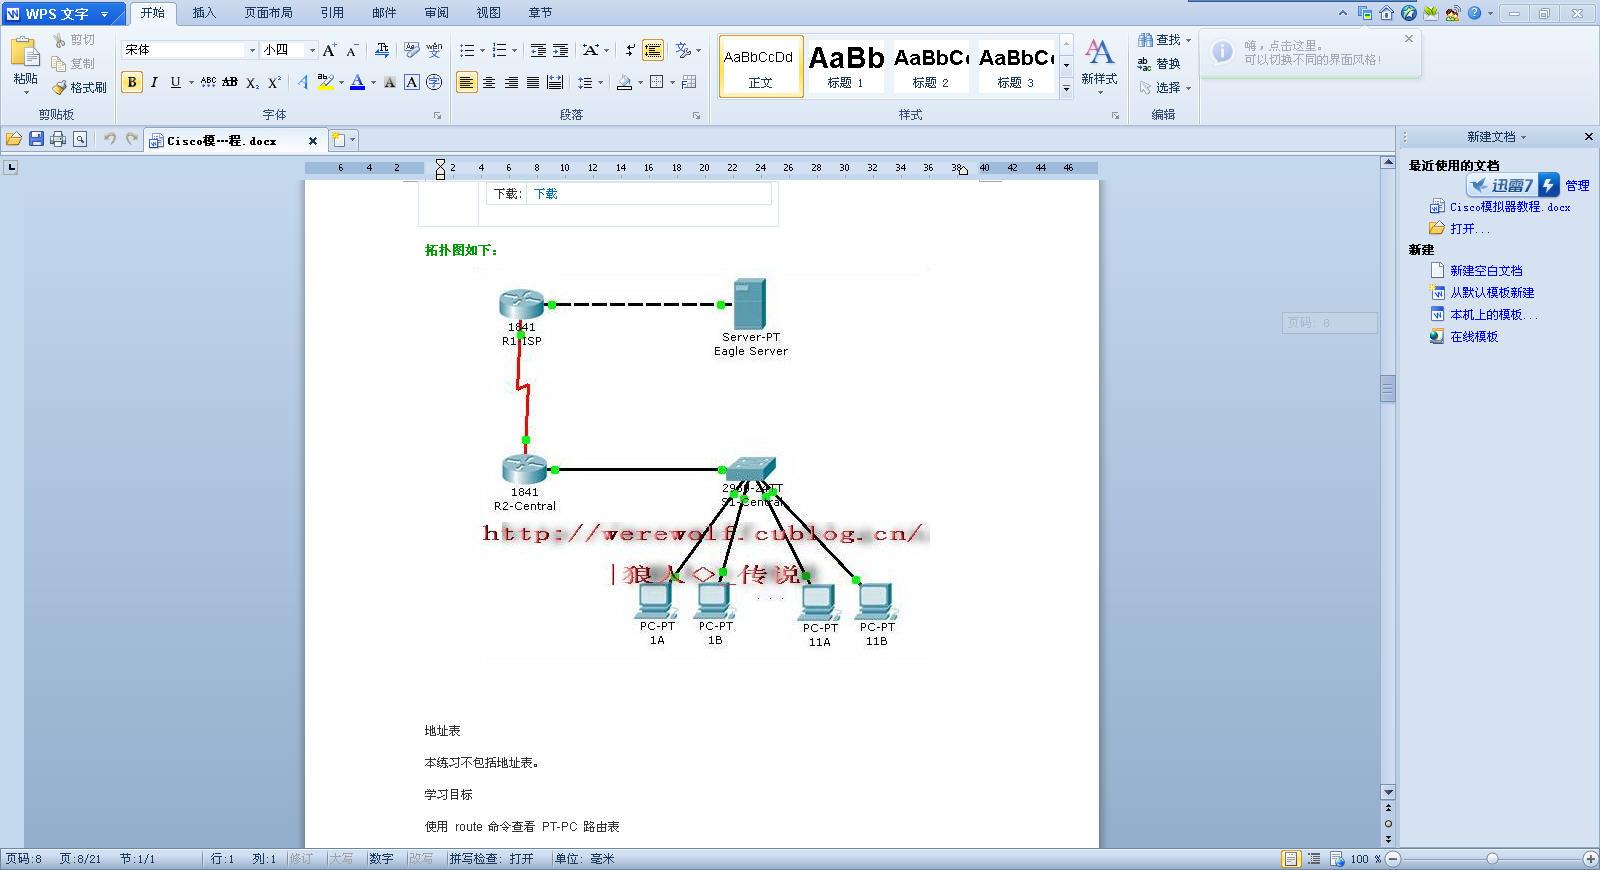 Cisco模拟器Packet Tracer软件使用图文教程